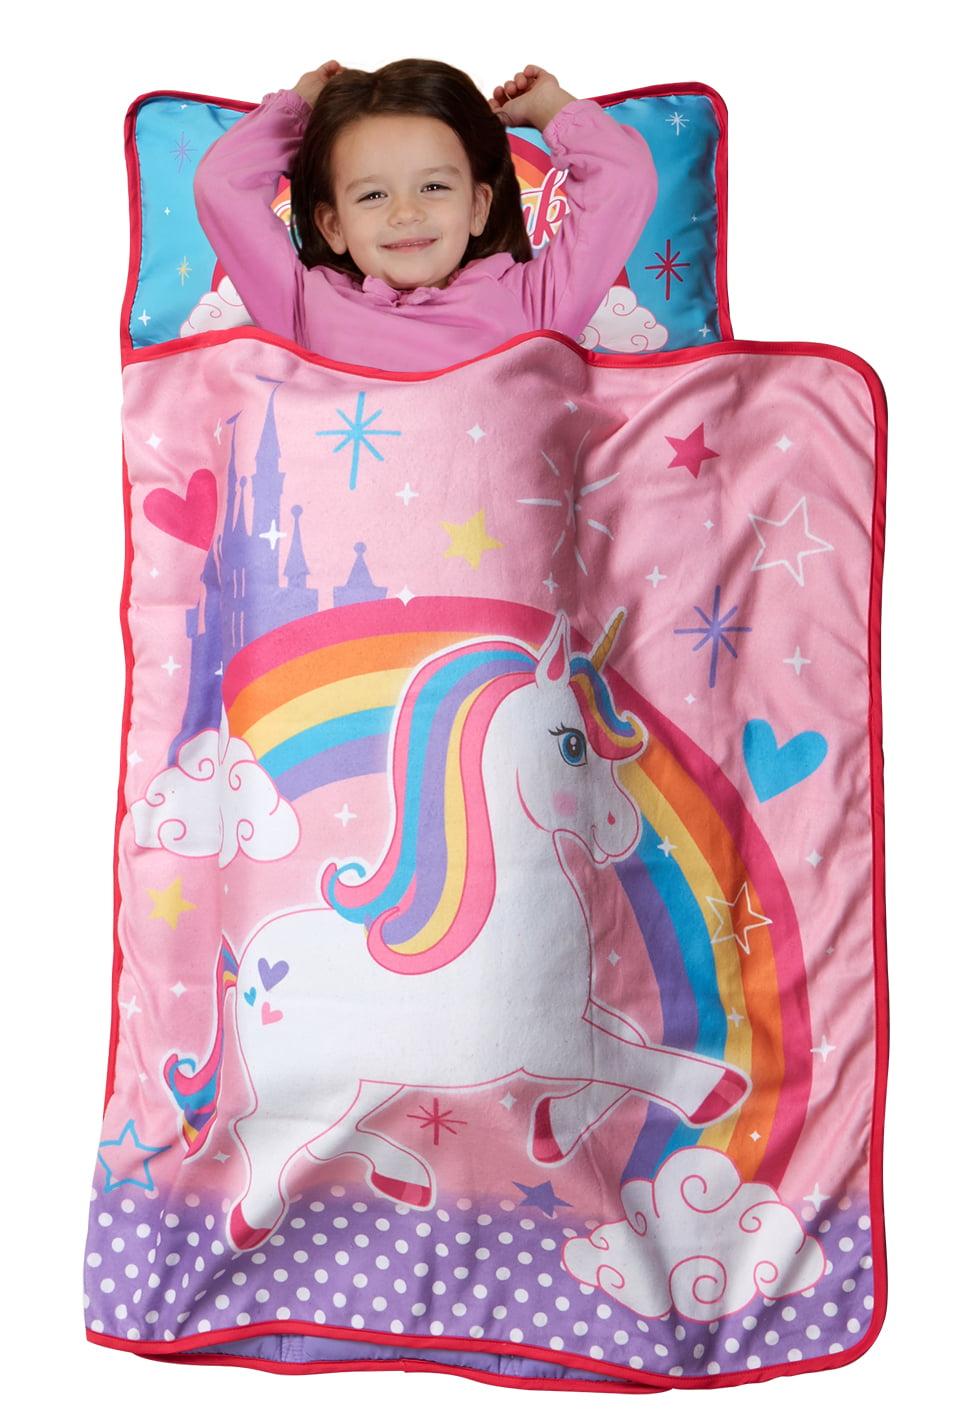 Baby Boom Unicorn Toddler Nap Mat by Baby Boom